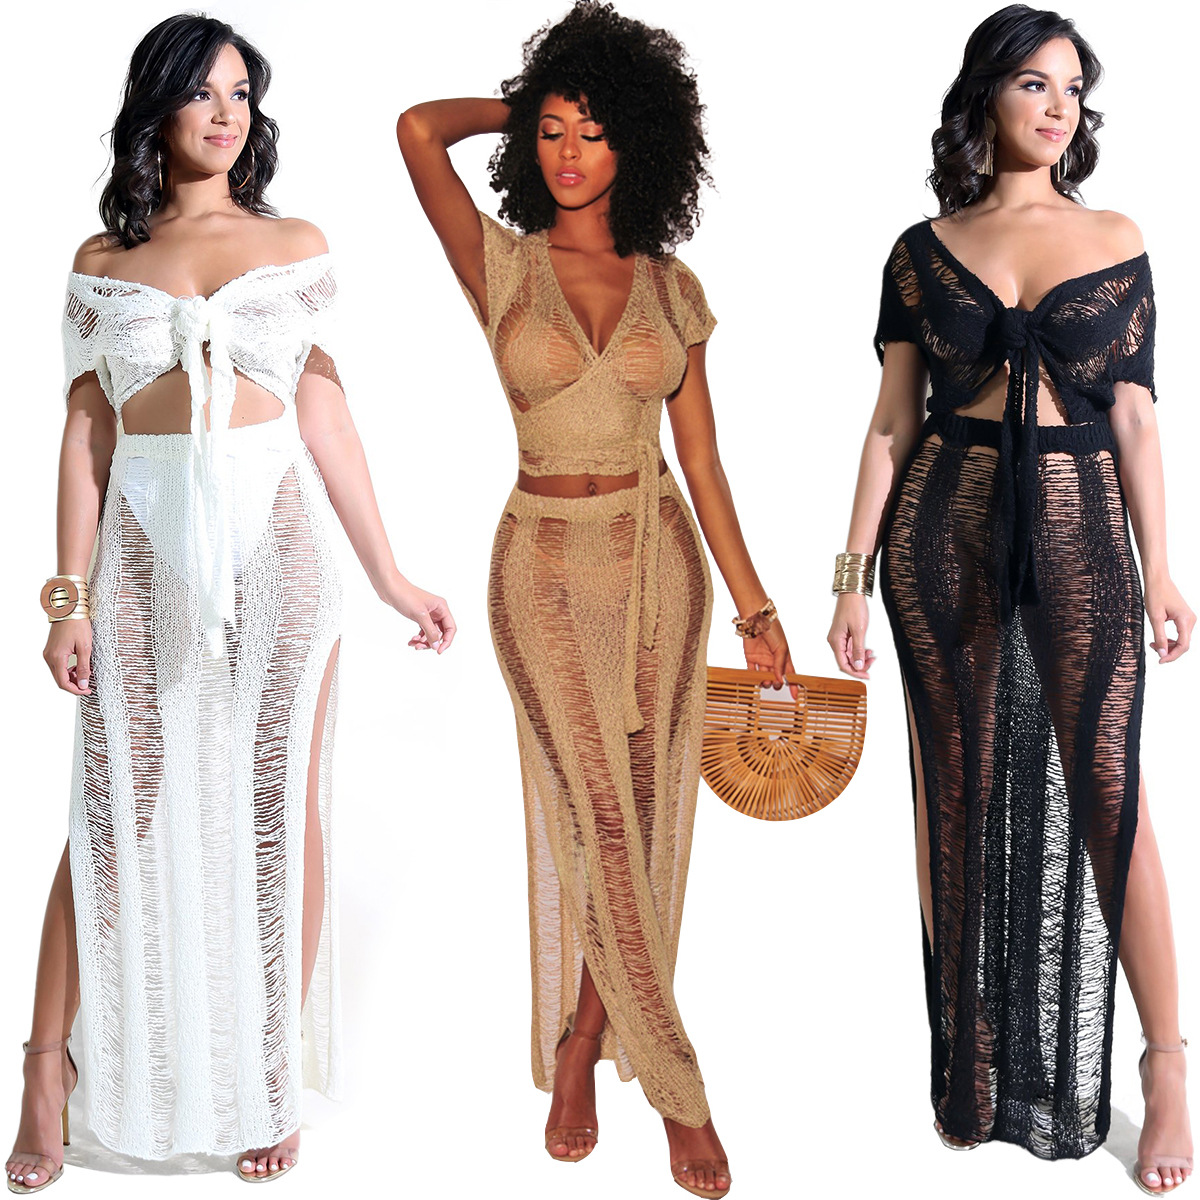 Sexy Women Two Piece Set Crop Bra Top Sheer Hollow out  knitting Split Skirt High Waist Vest Skirt Set Party Nightclub Outfit